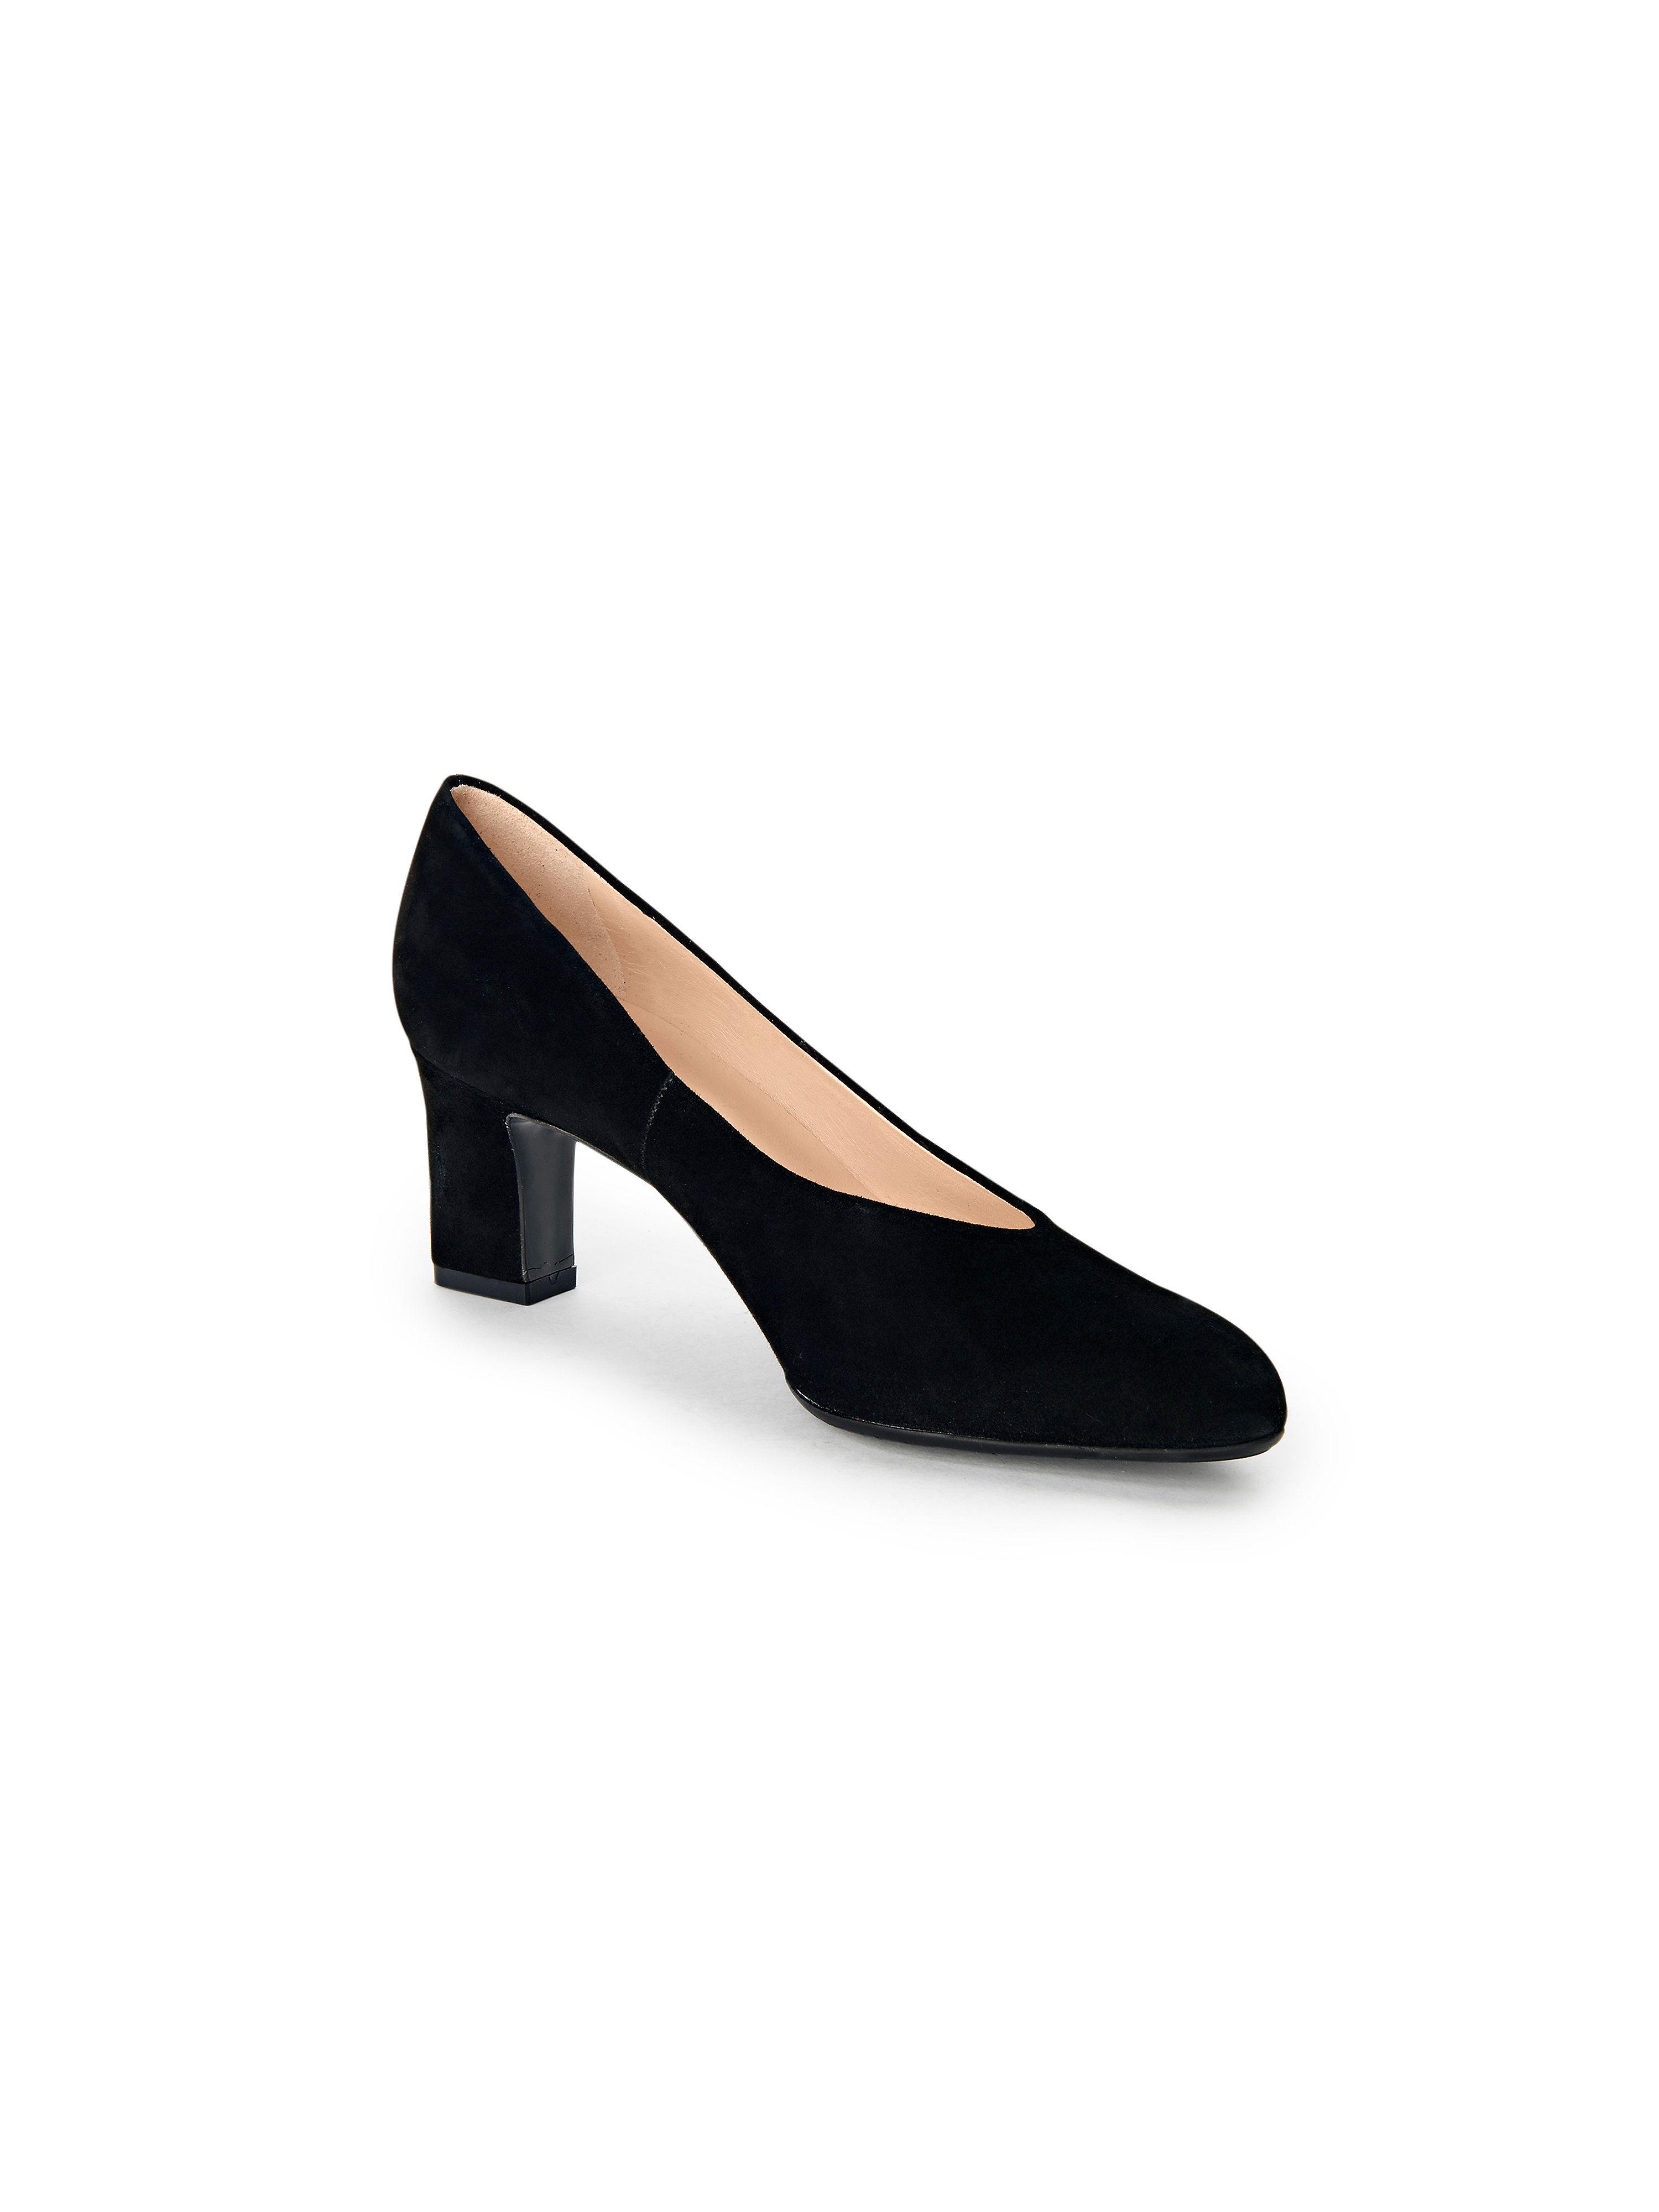 Peter Kaiser - Pumps Mahirella au 100% Leder - Schwarz Gute Qualität beliebte Schuhe